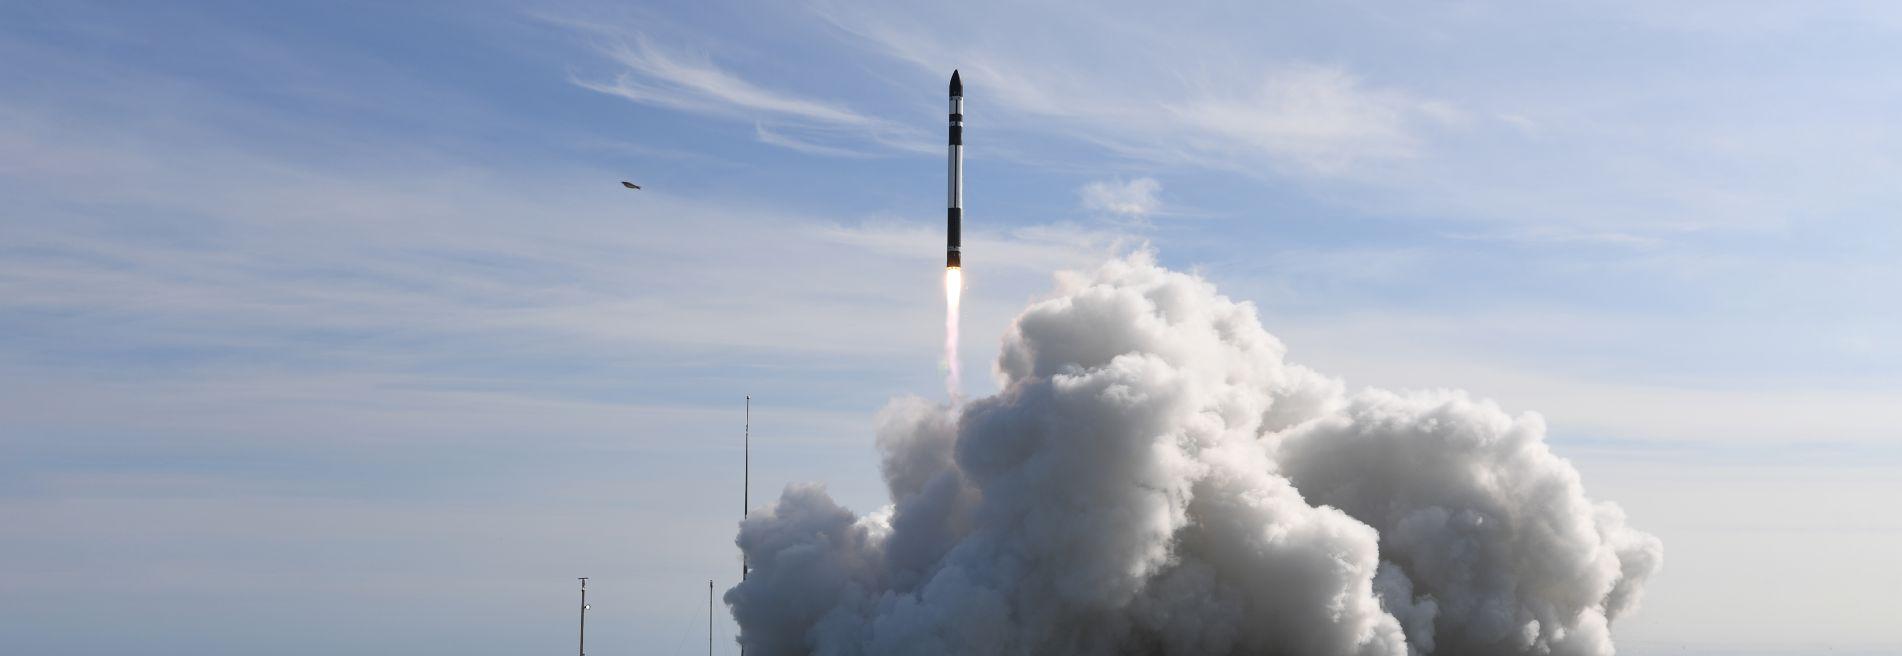 desktop-rocket.jpg